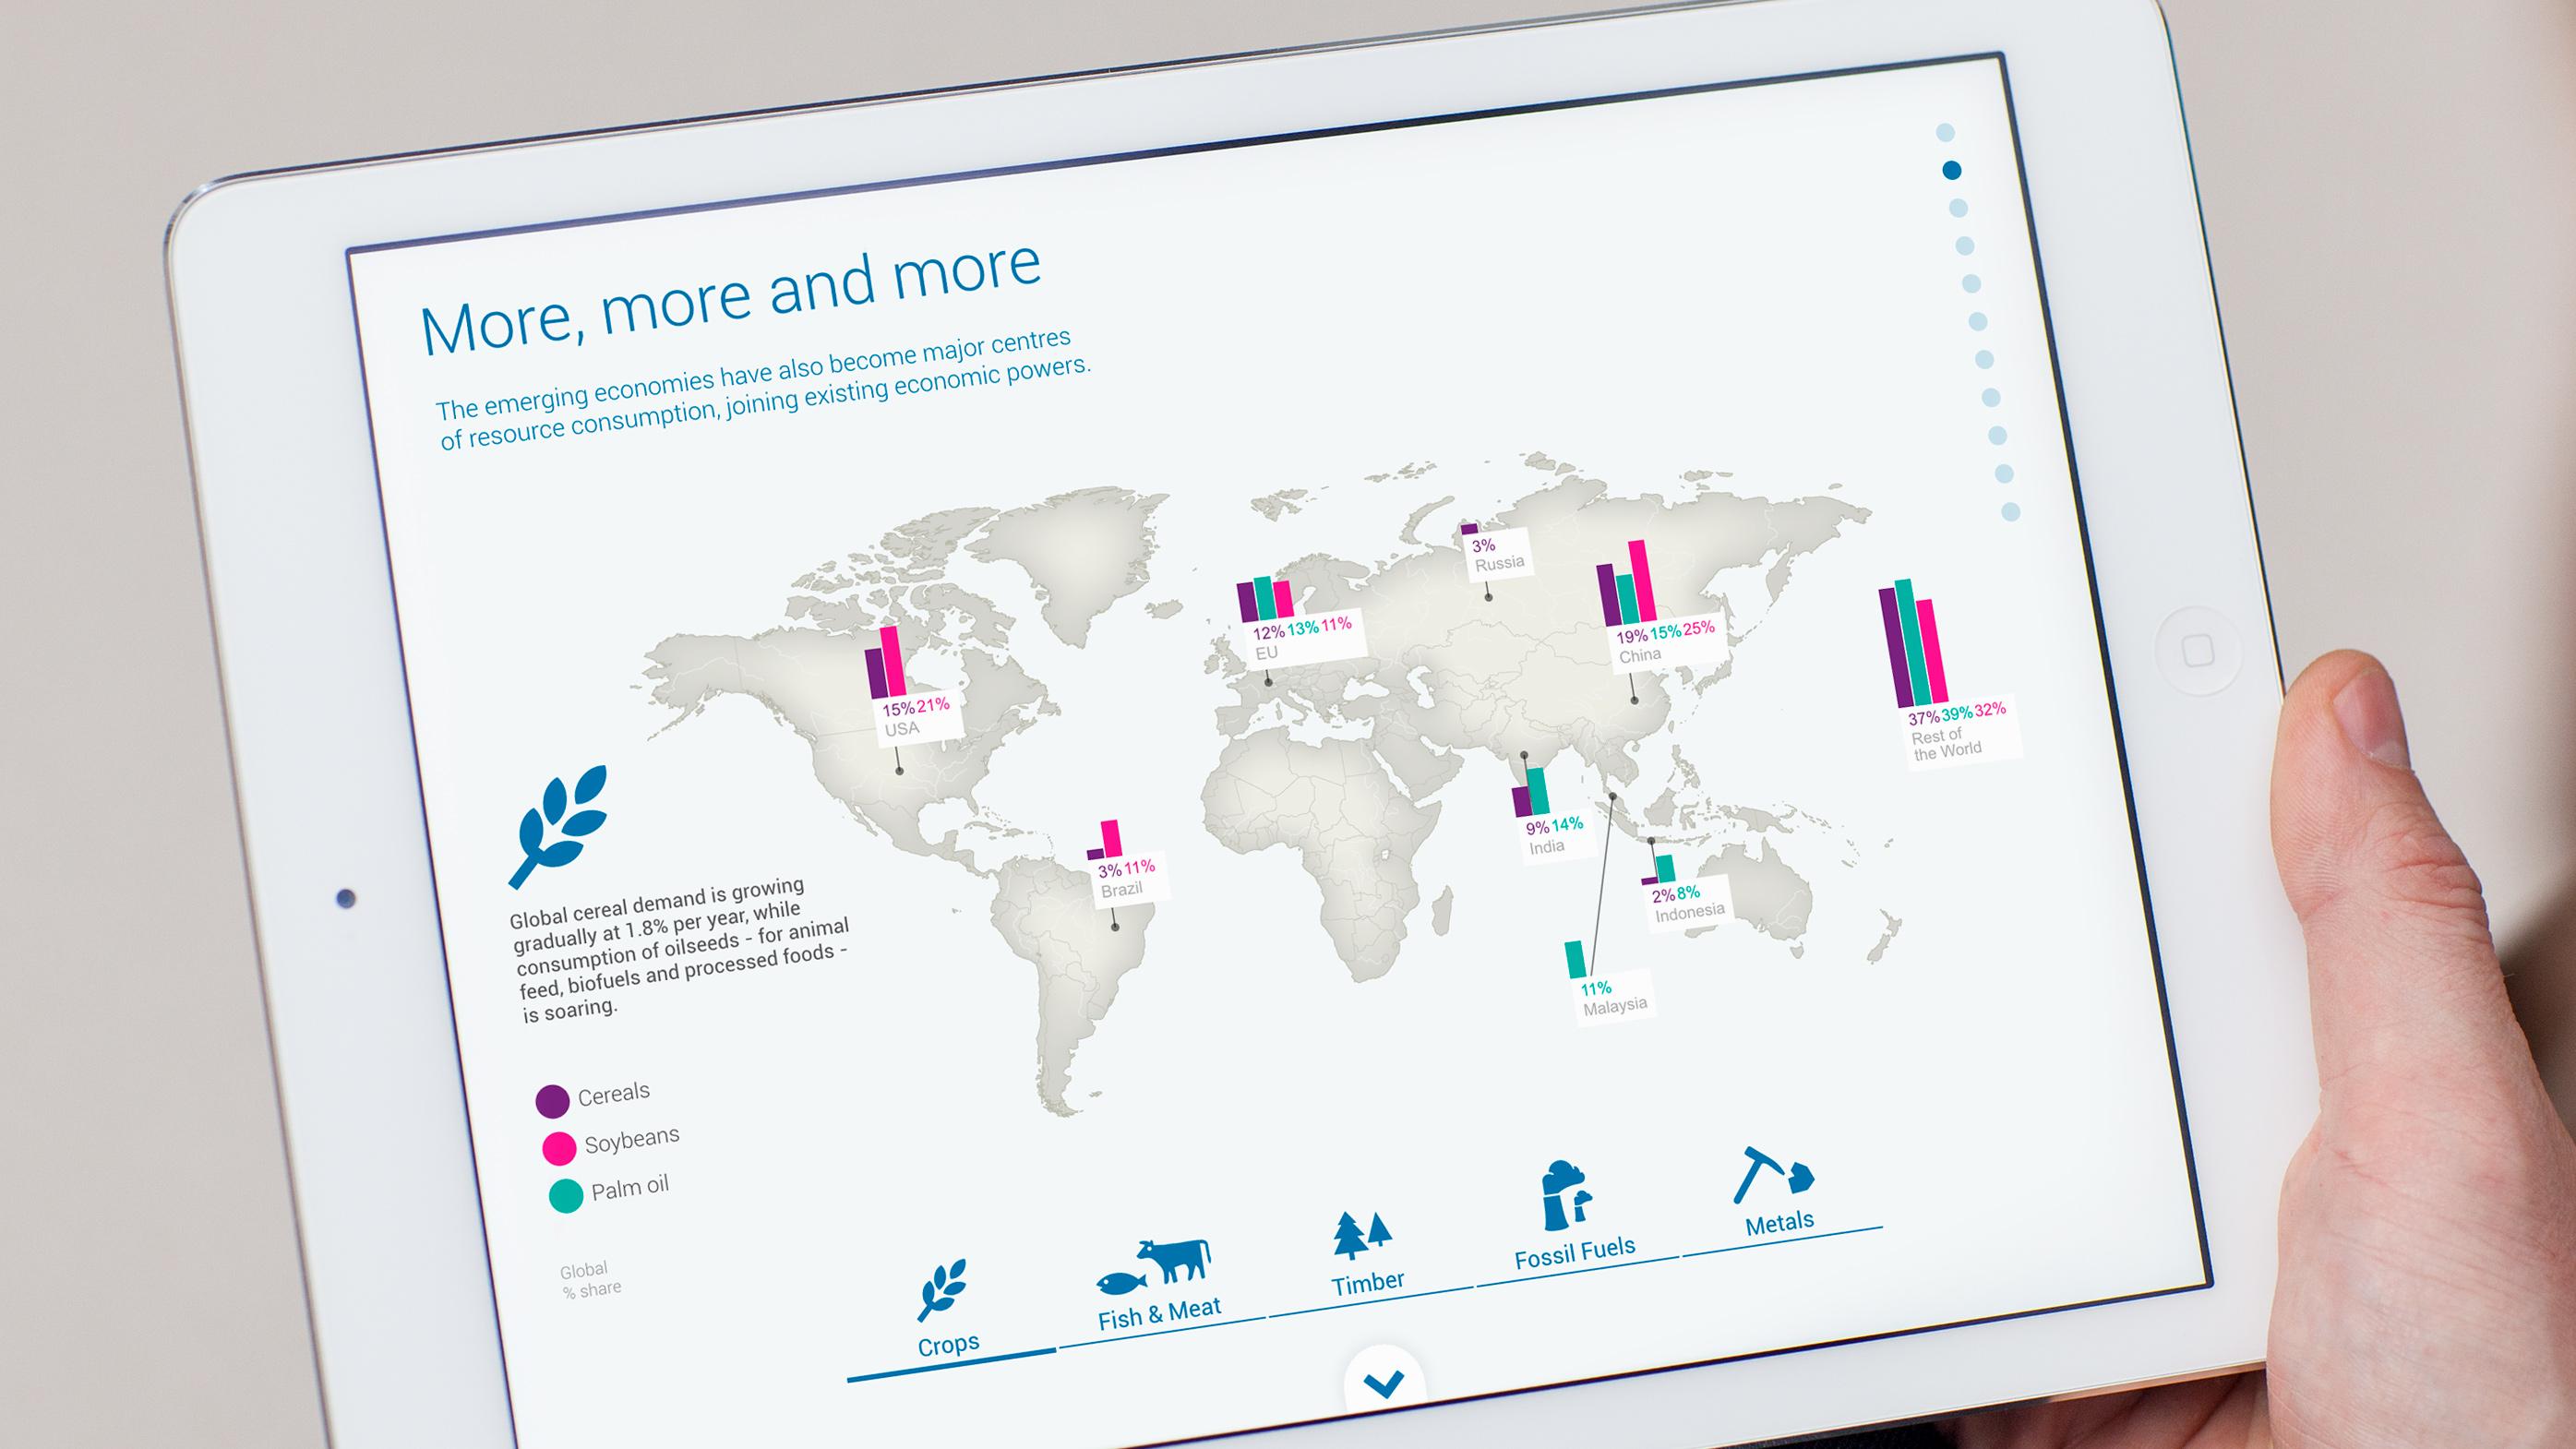 Chatham House Resources Futures Data Visualisation